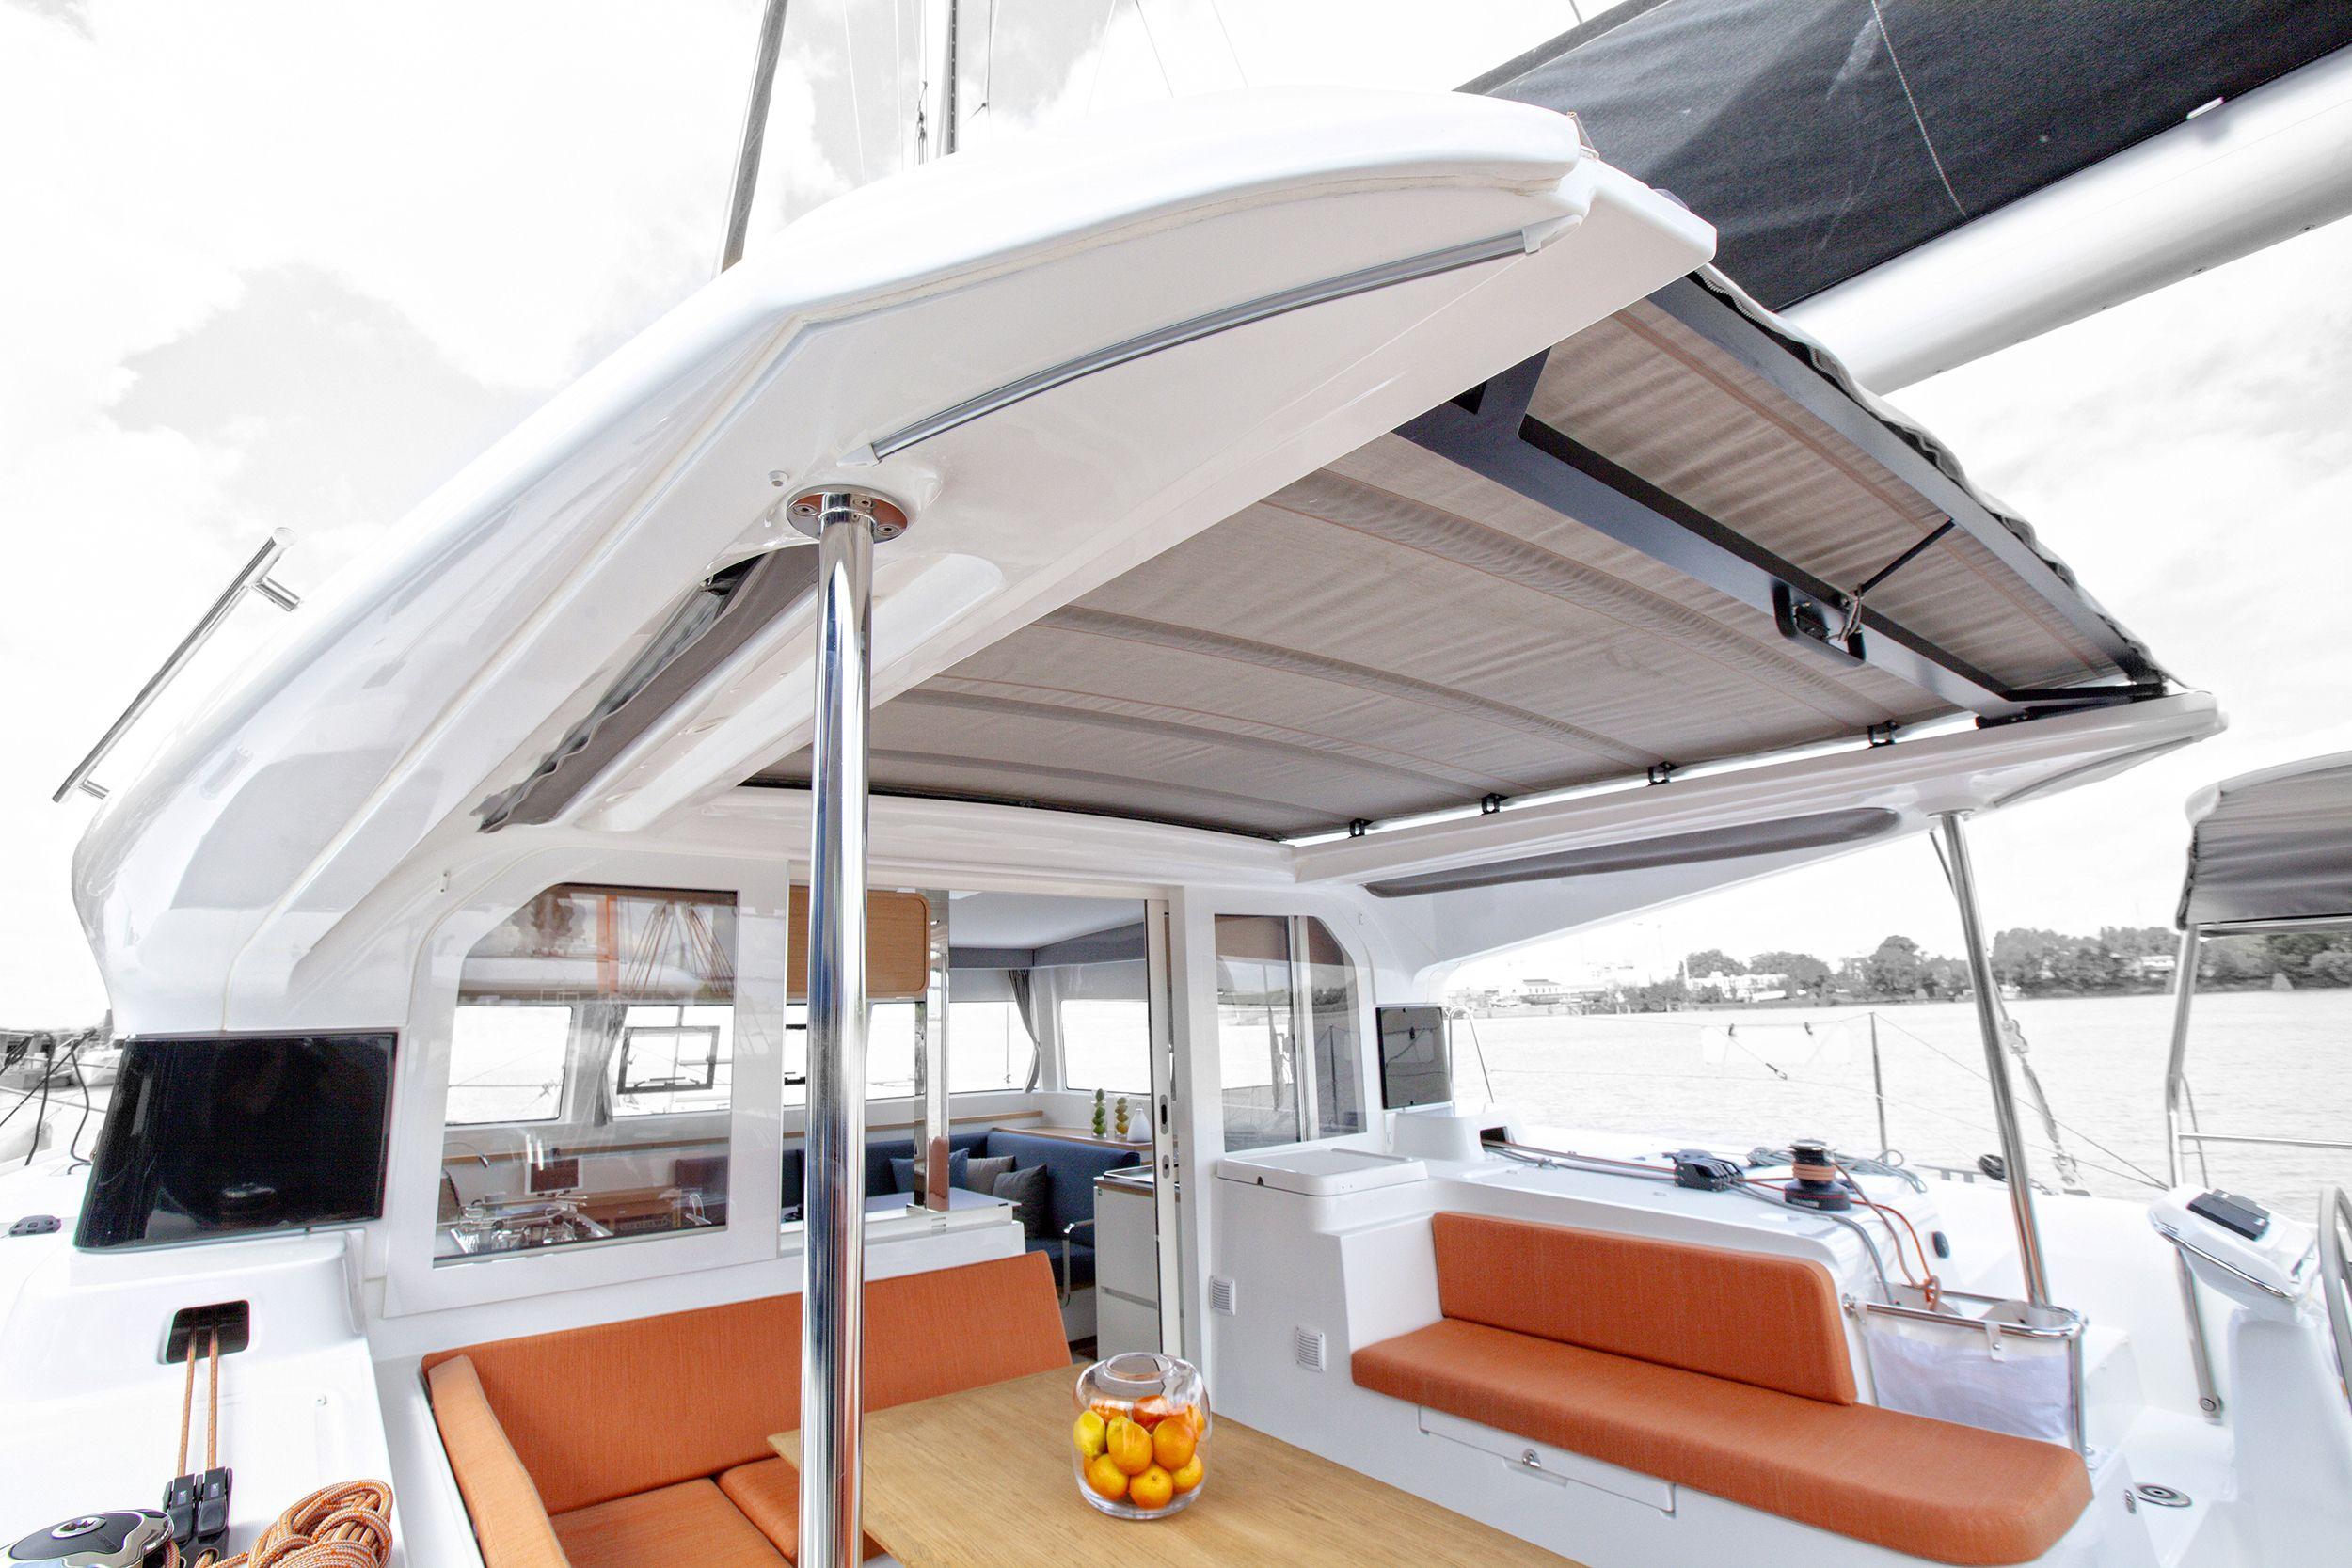 Aft deck space